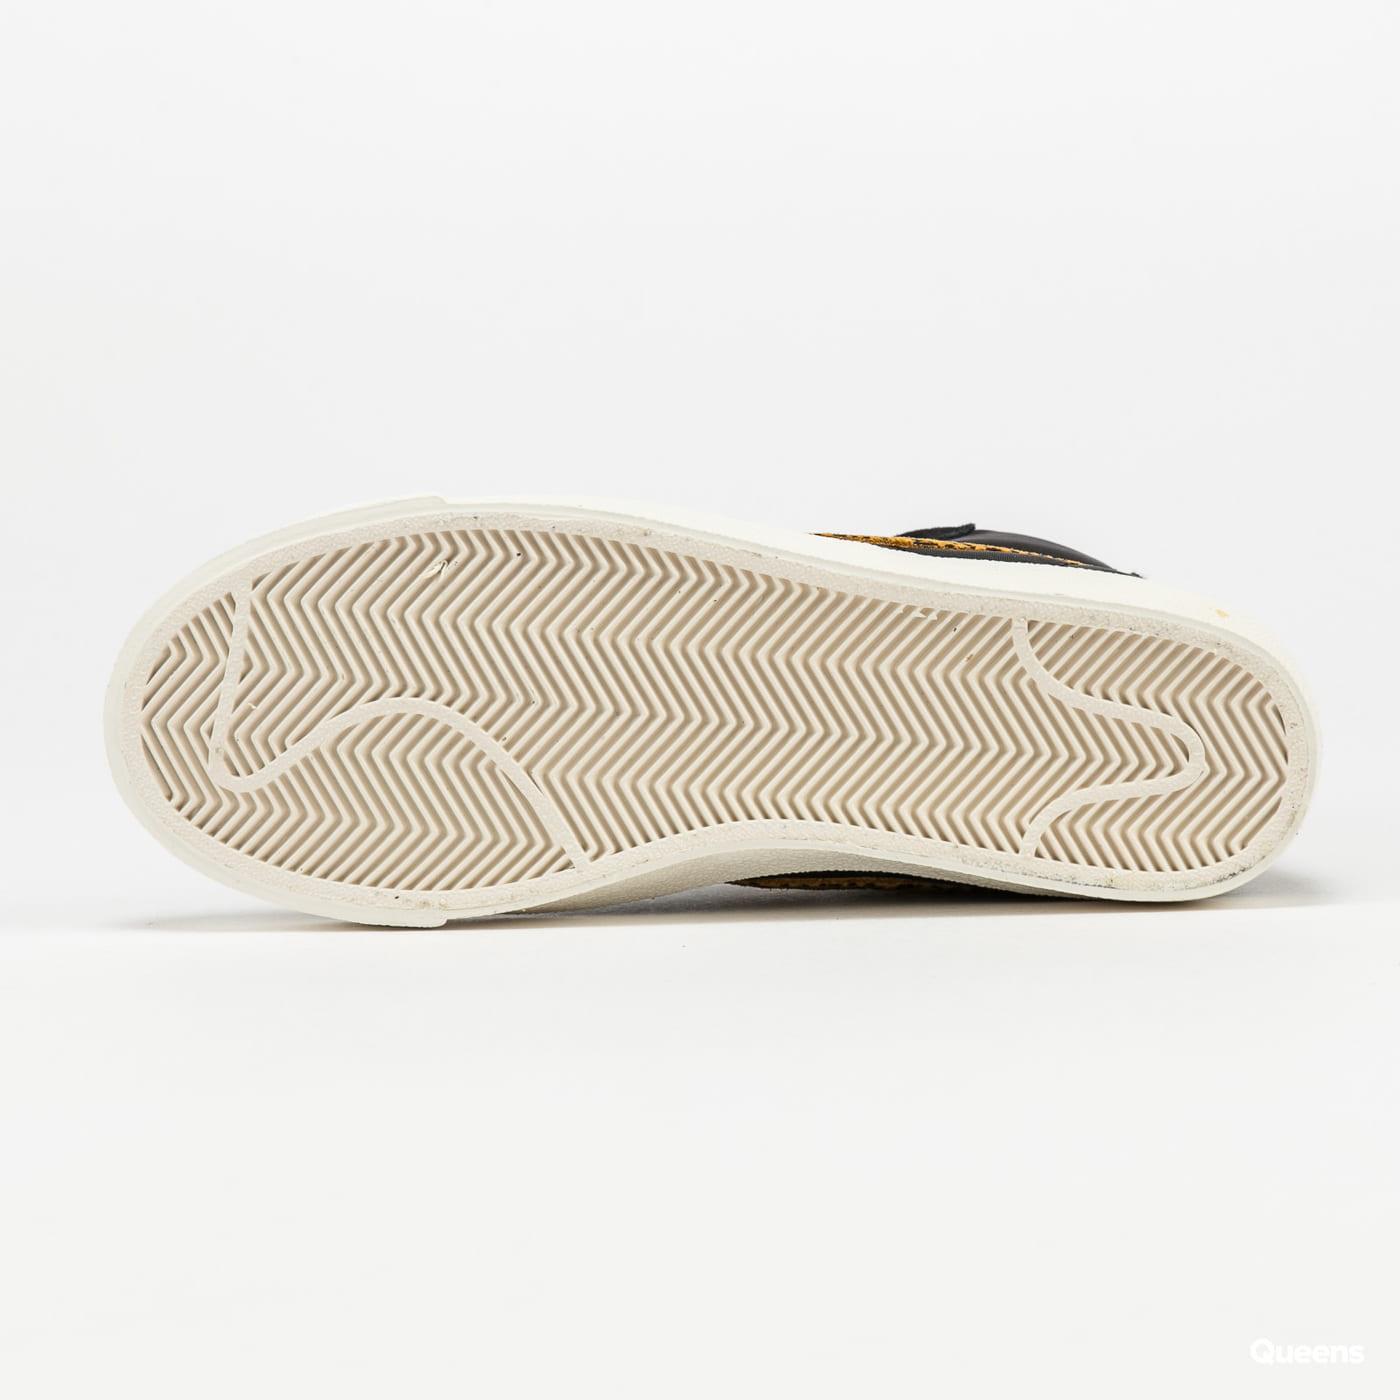 Nike WMNS Blazer Mid '77 black / chutney - sail